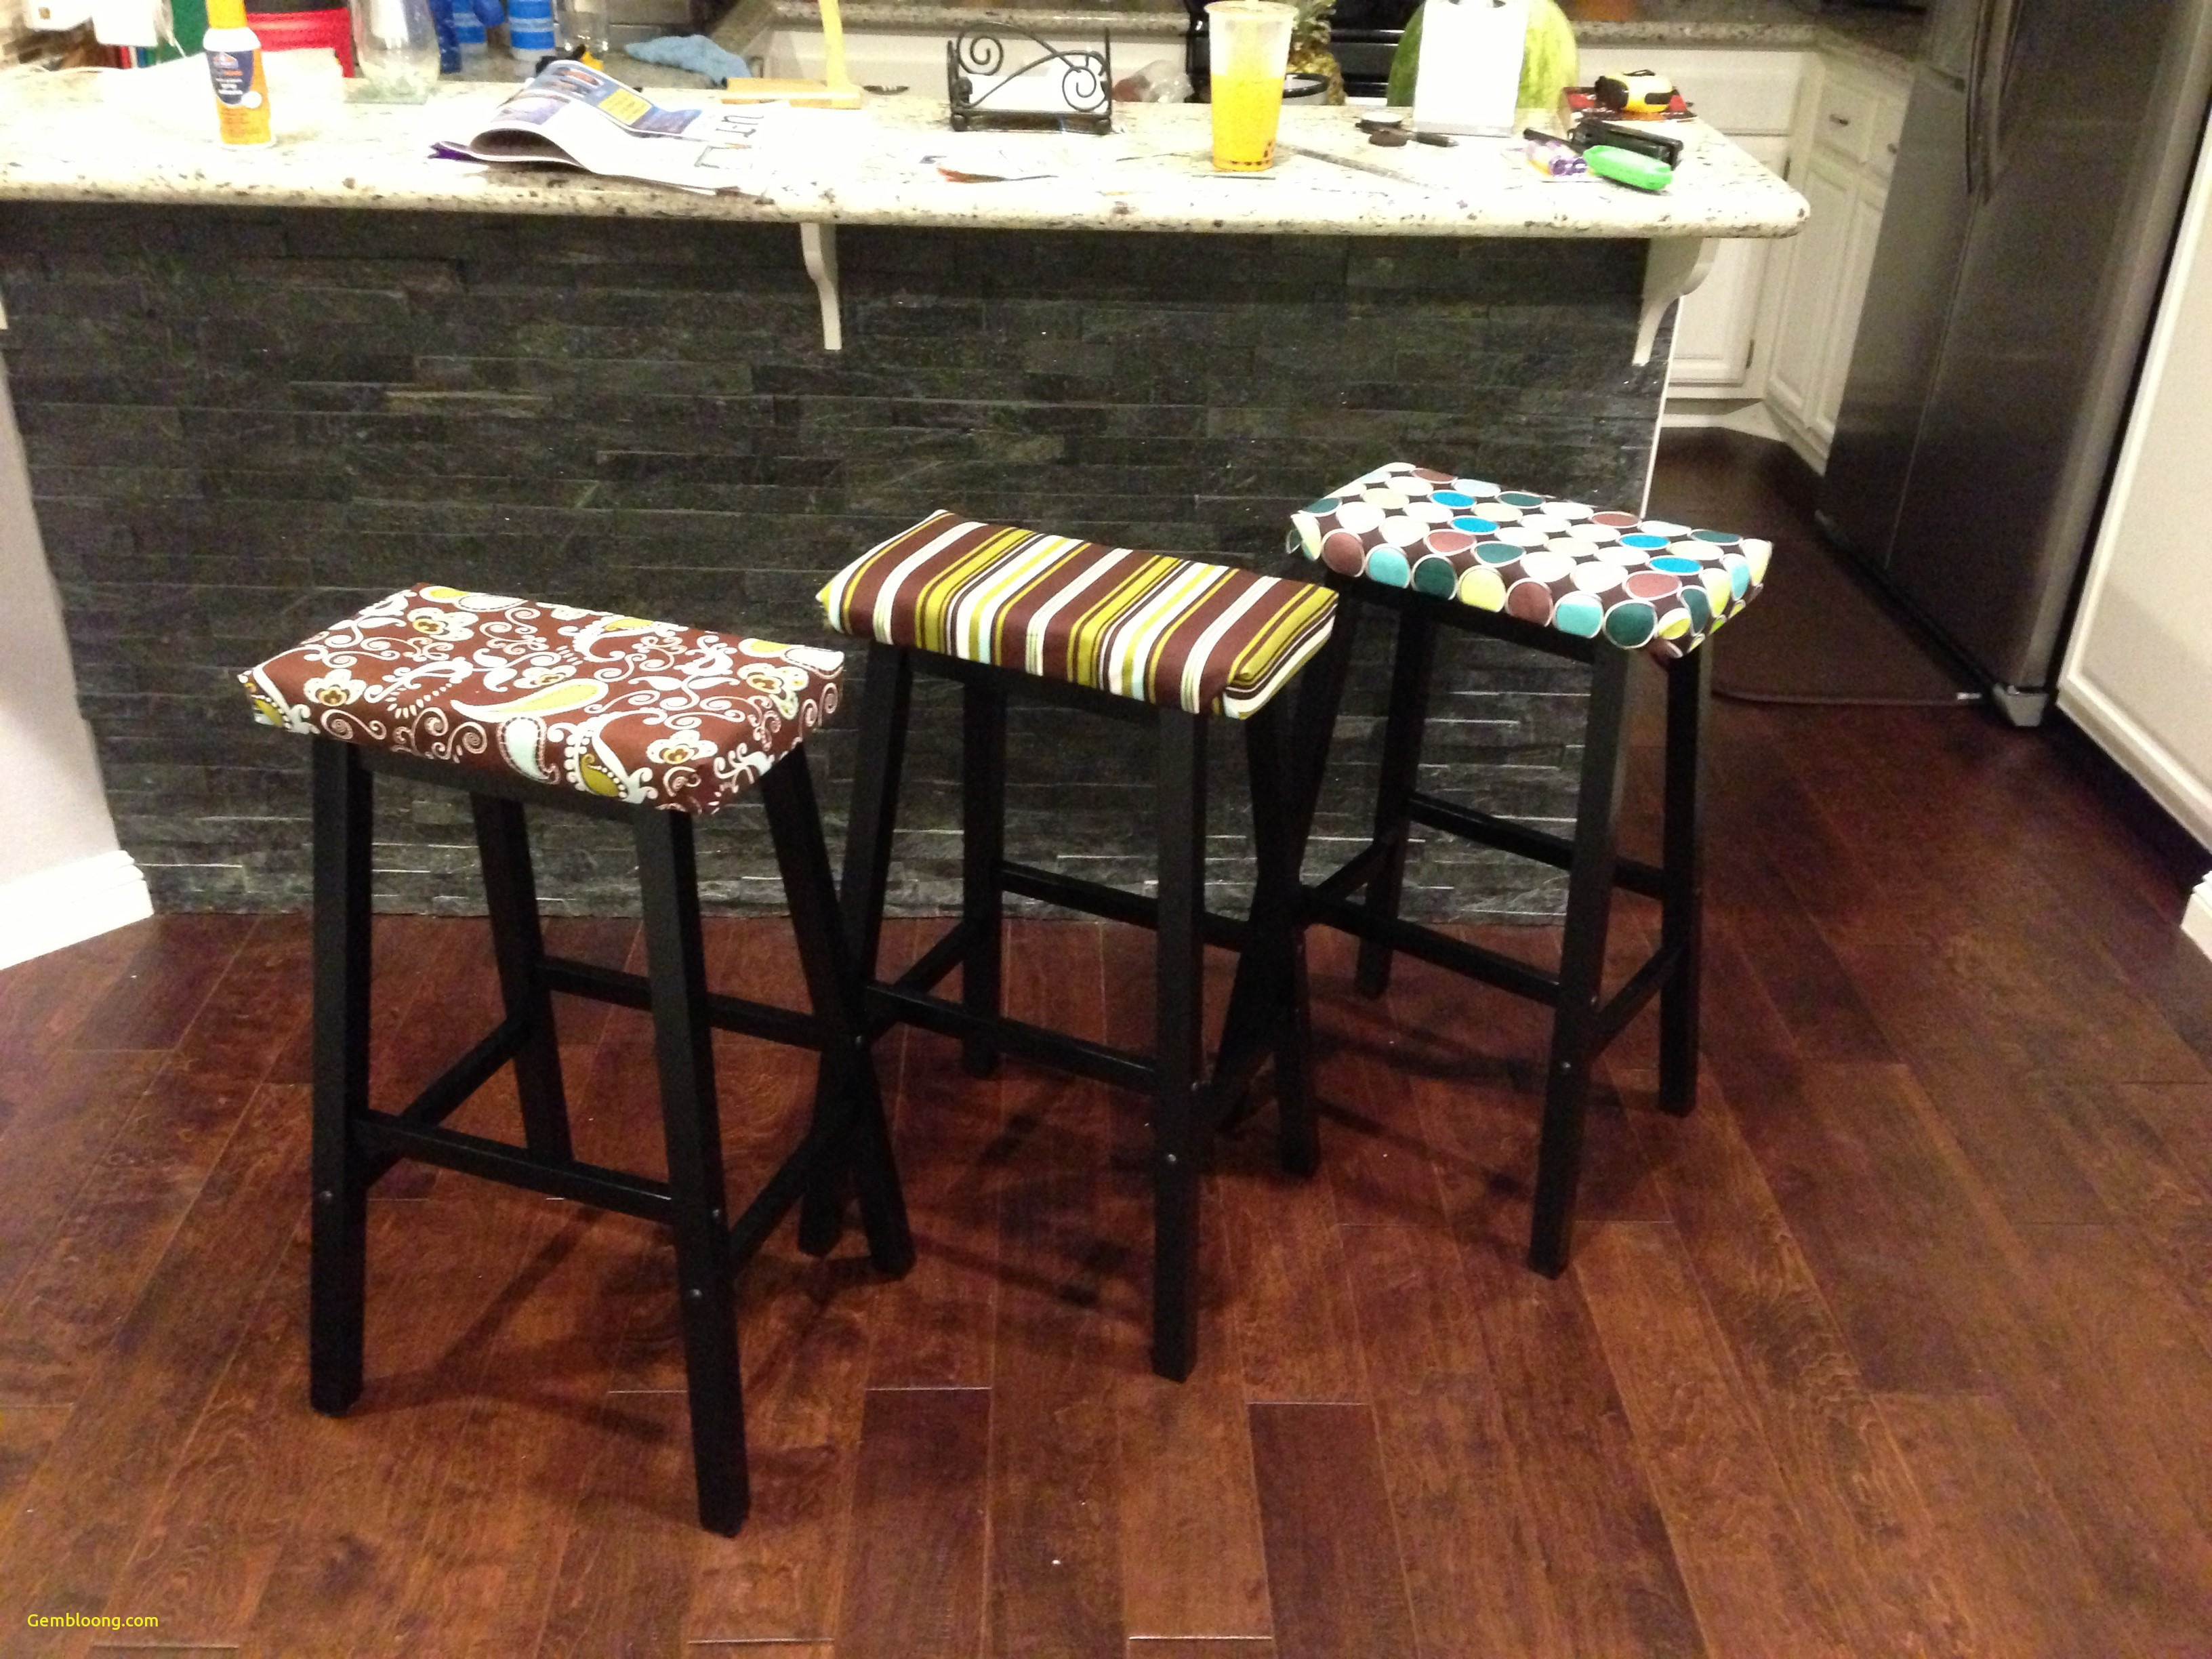 Restoring Hardwood Floors Yourself Of Diy Home Furniture Home Design Diy Bar Stools Best Chair Wicker with Regard to Diy Home Furniture Home Design Diy Bar Stools Best Chair Wicker Outdoor sofa 0d Scheme